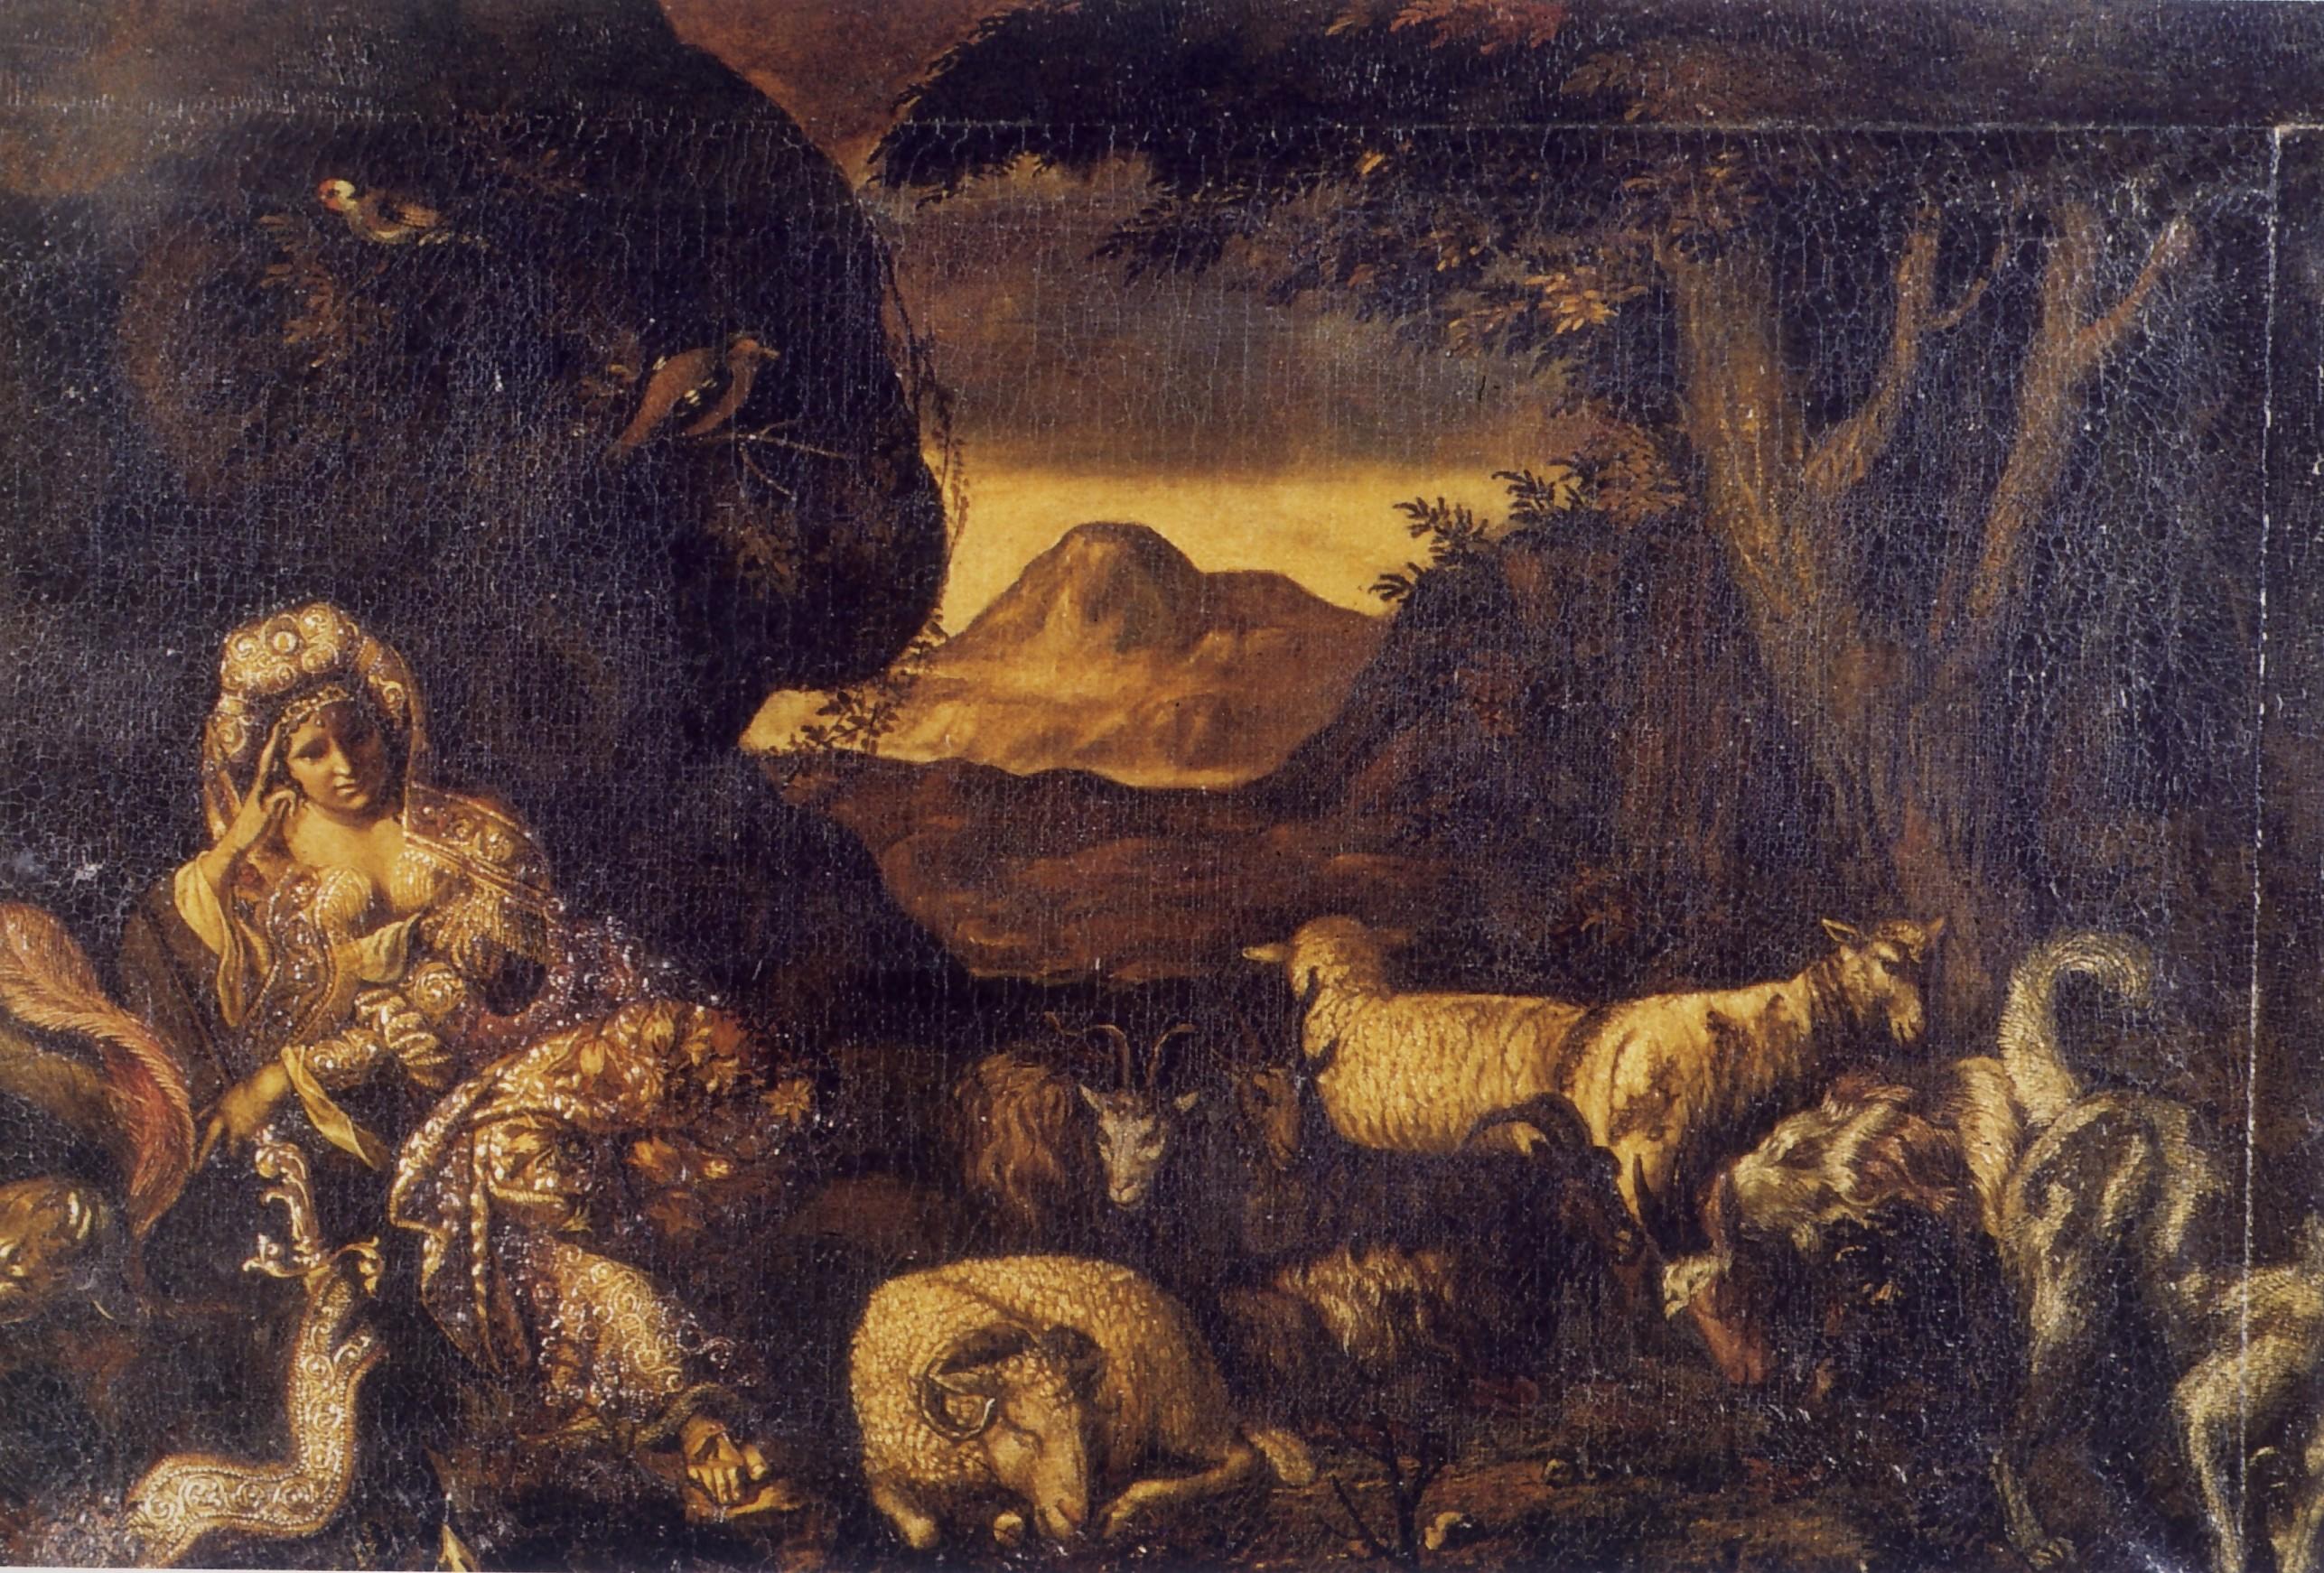 Angelo Caroselli, La strega, secolo XVII, Museo statale d'arte medievale e moderna